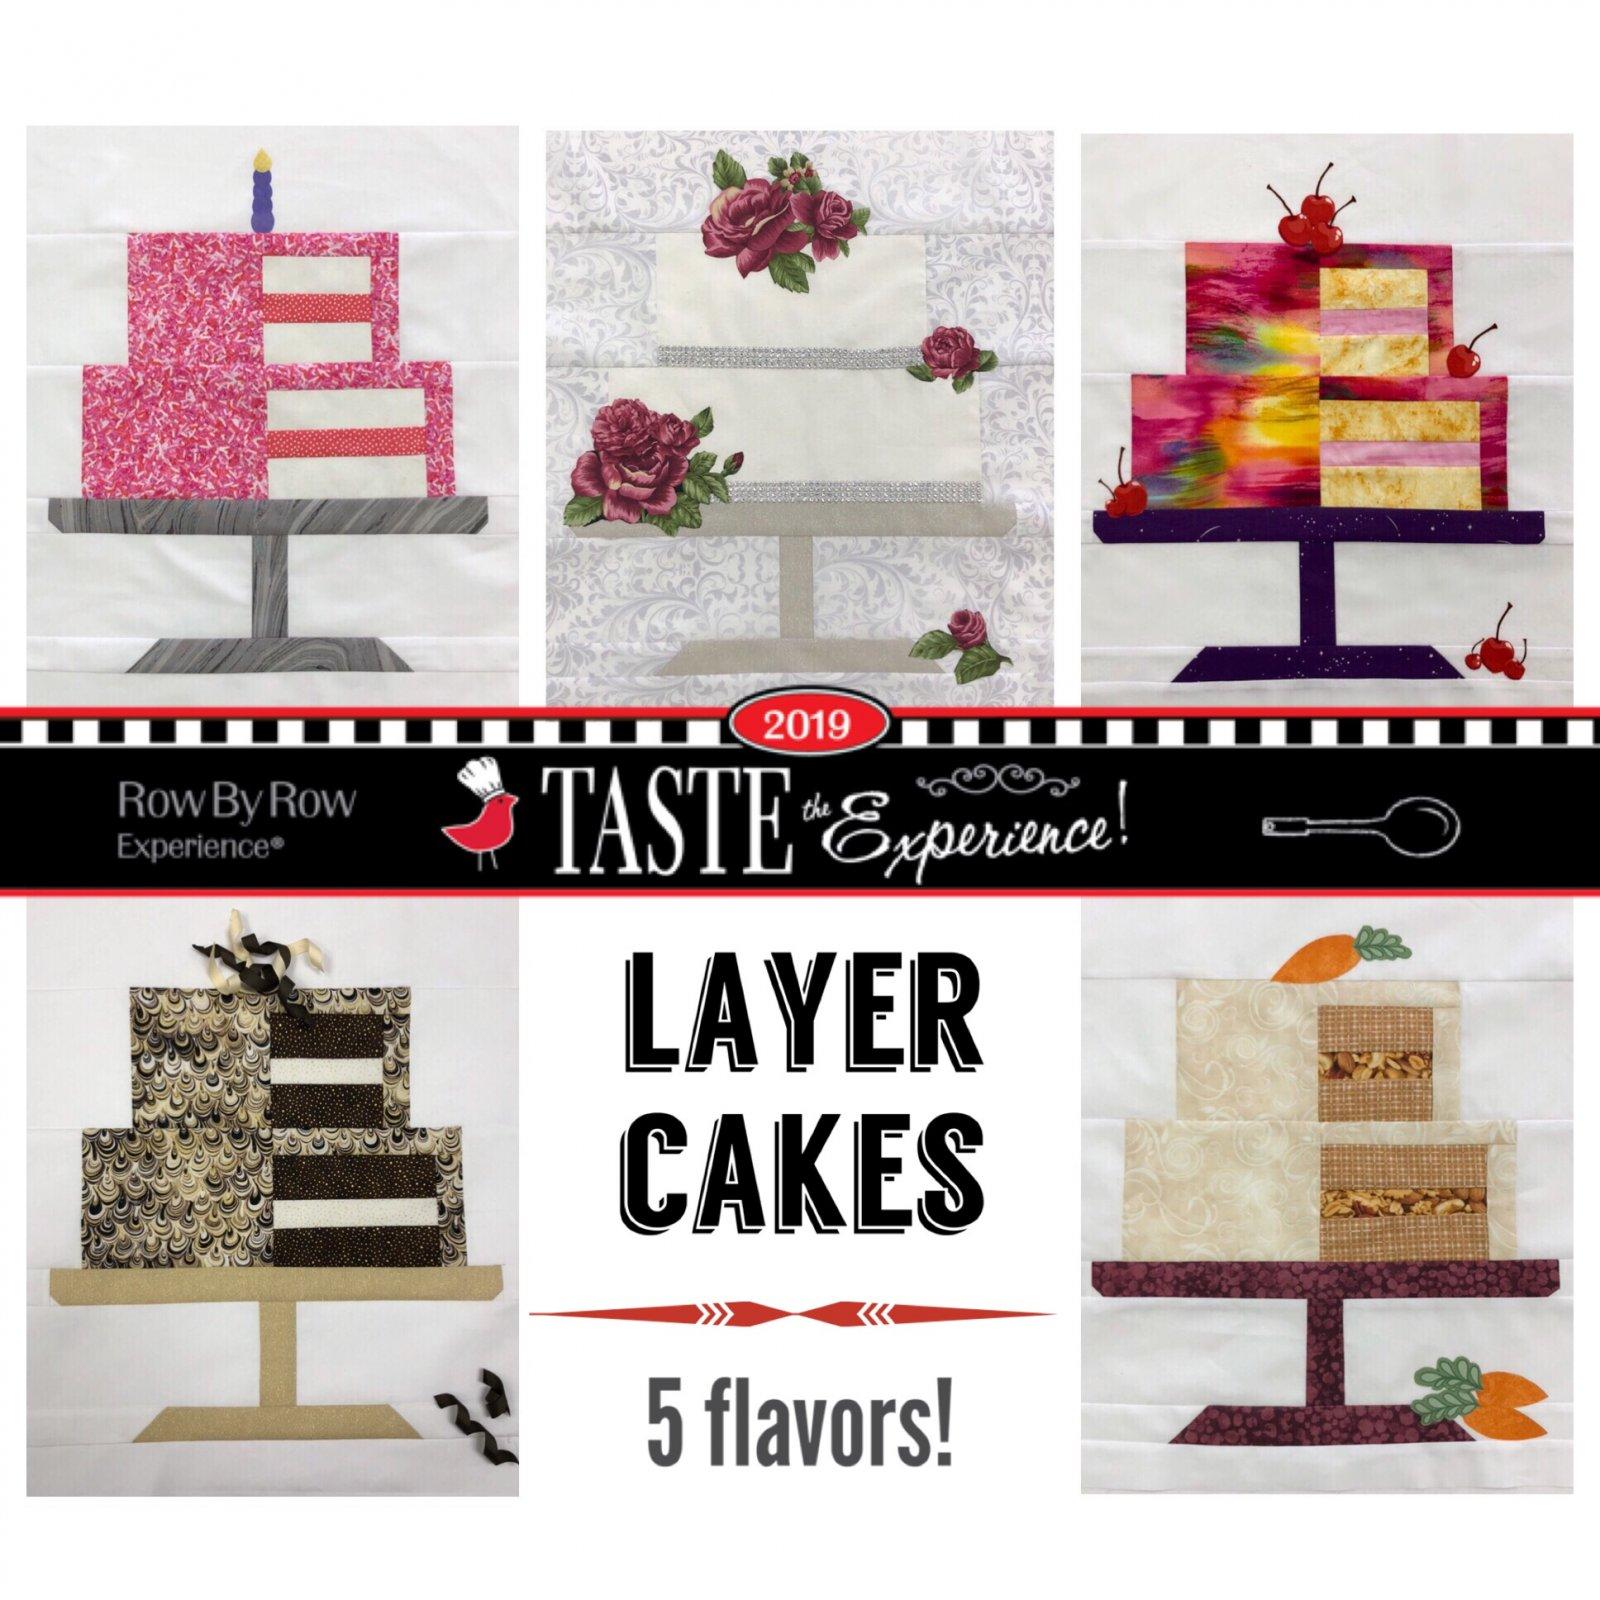 RxR 2019 - All 5 Cake Blocks <br> ($10.00 savings!)